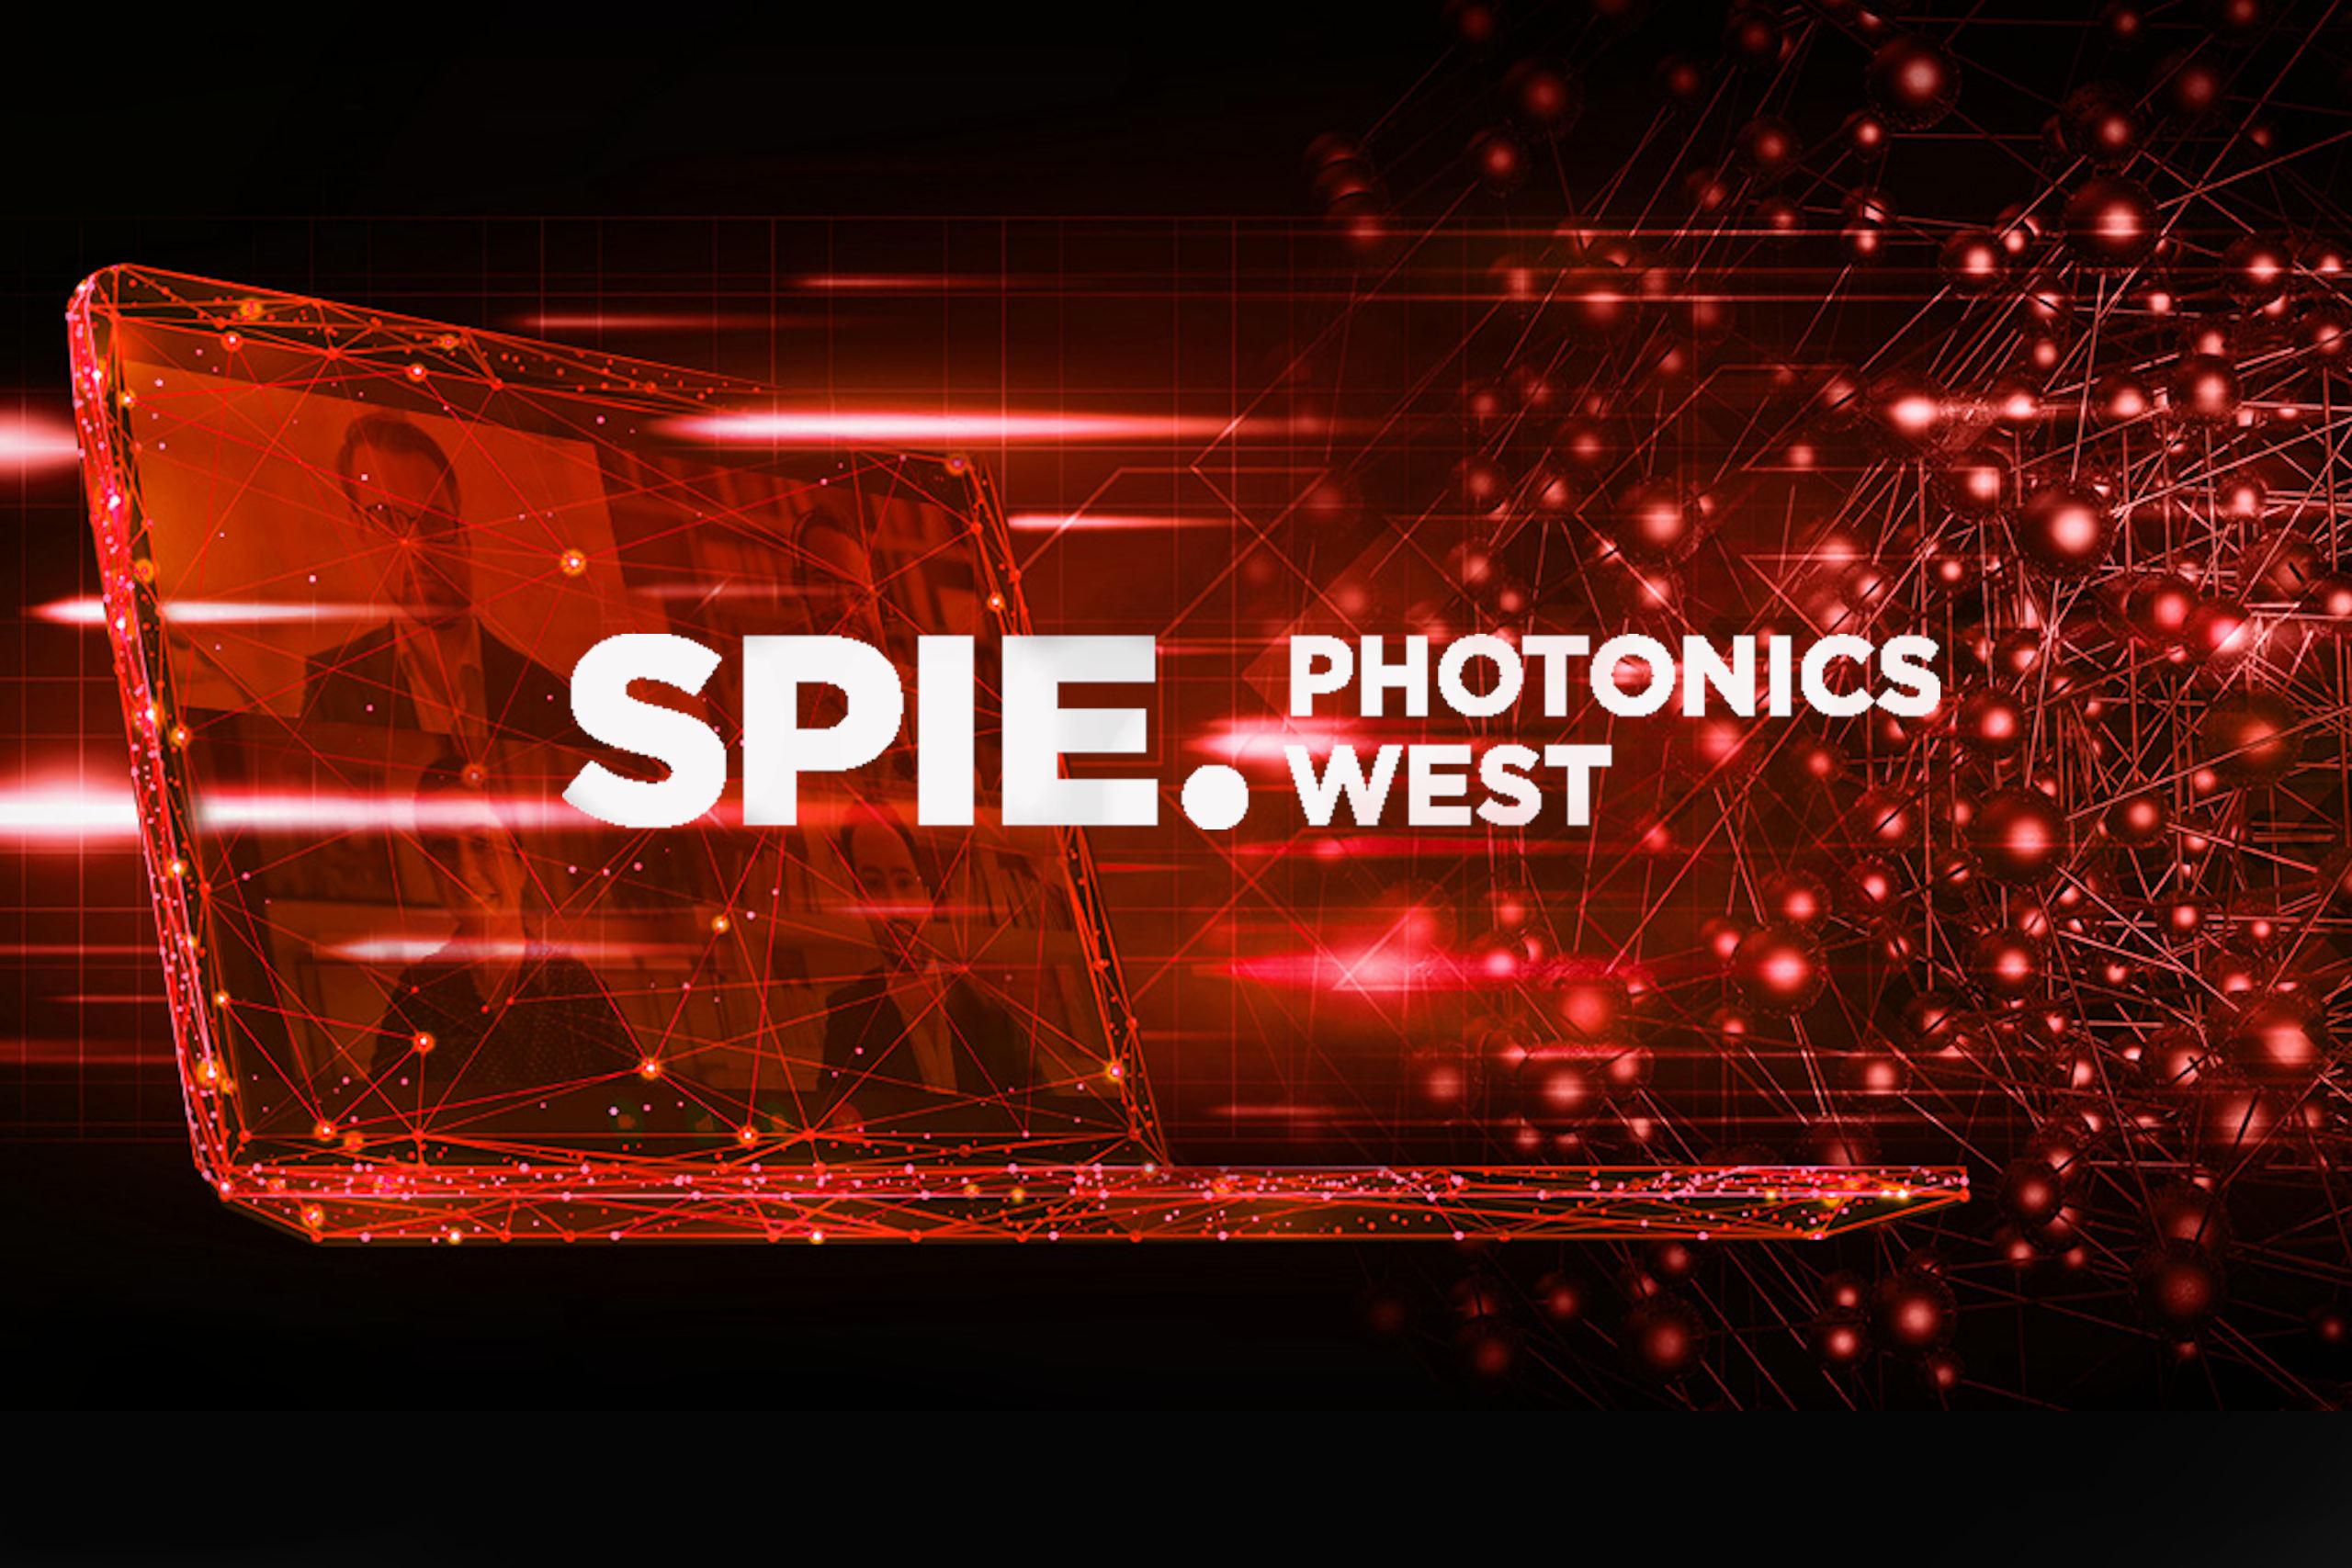 SPIE-Photonics-West